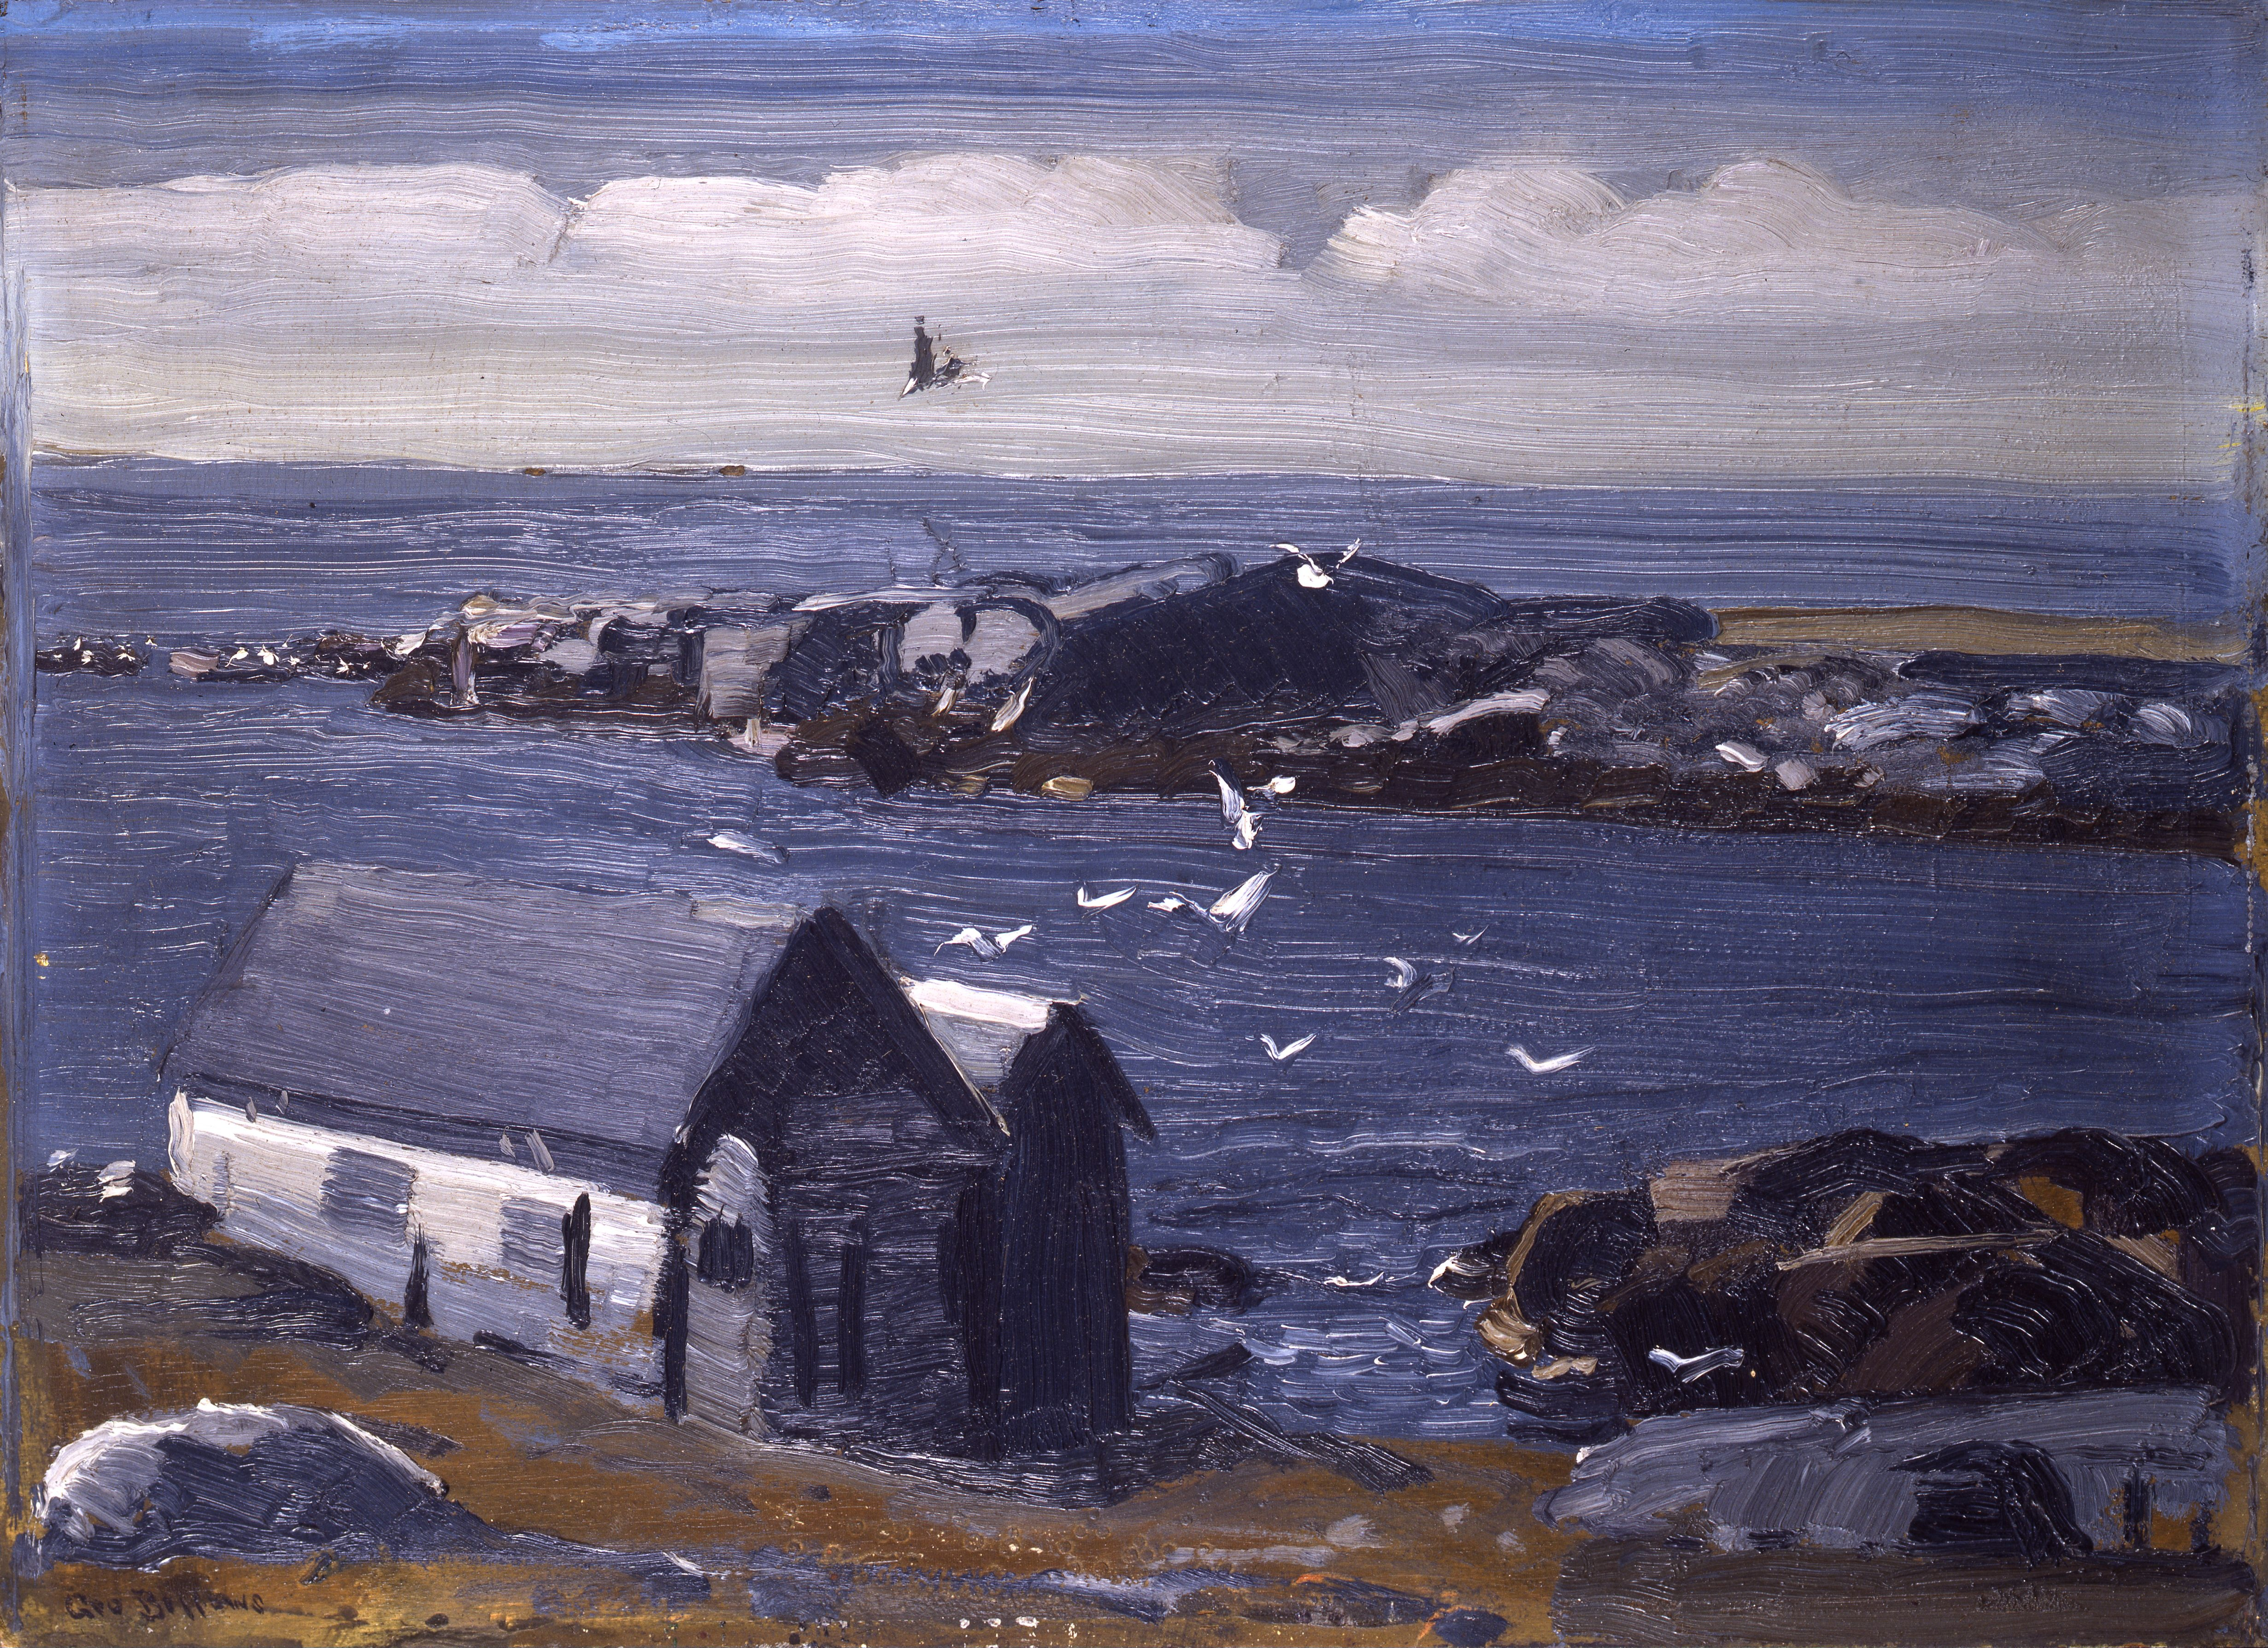 University Of Maine >> File:George Bellows - The Gulls, Monhegan.jpg - Wikimedia